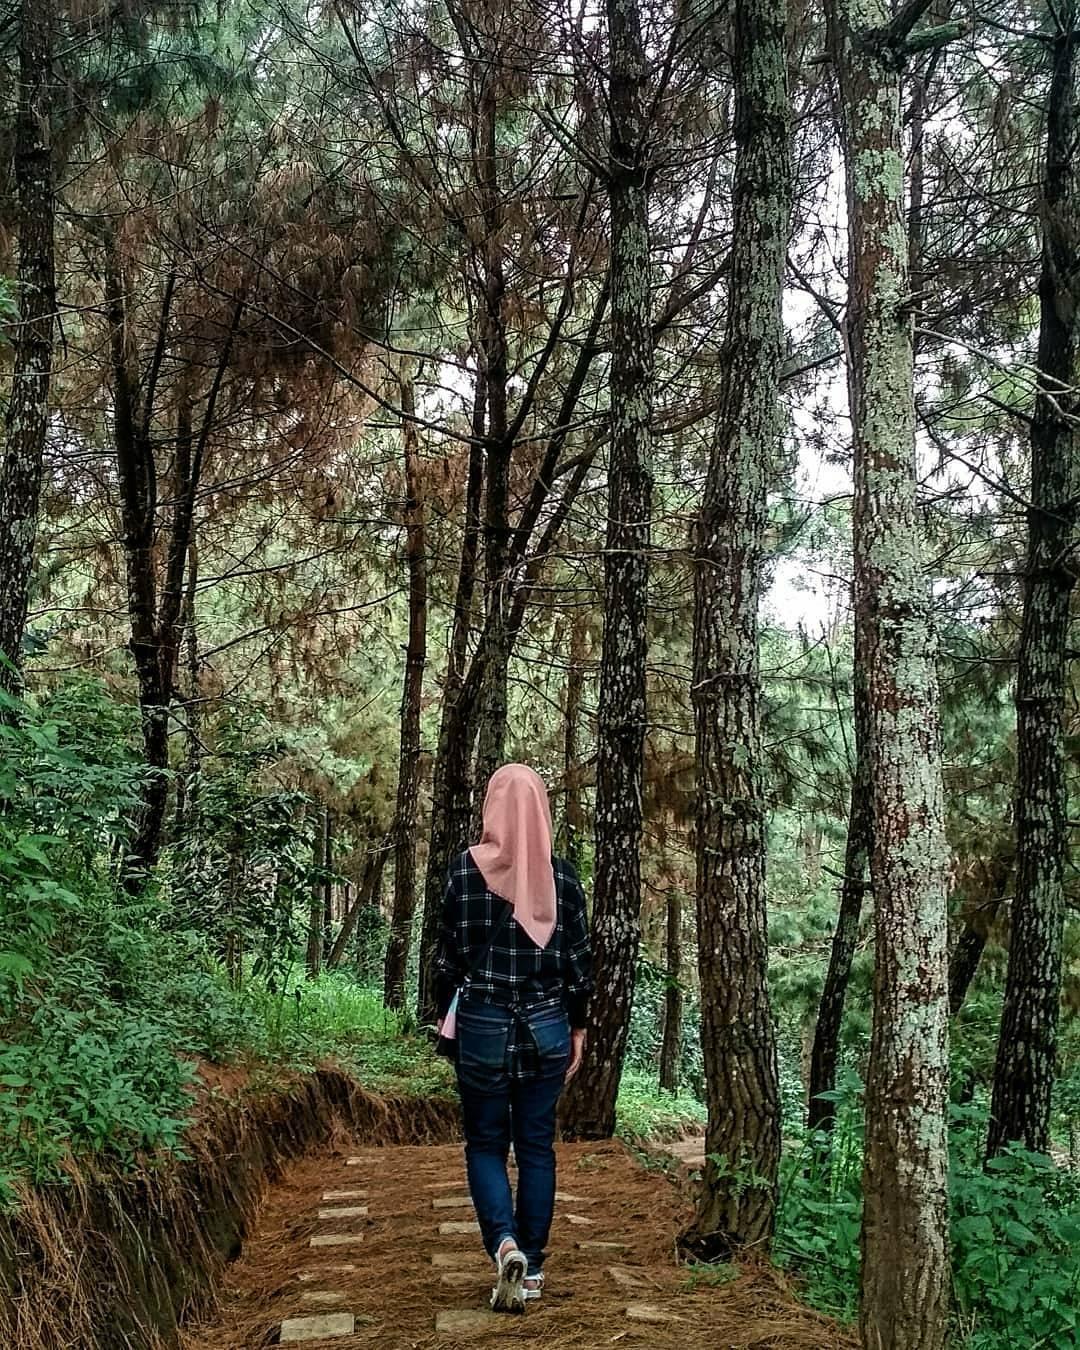 Hutan Pinus, Malang, Kabupaten Malang, Dolan Dolen, Dolaners Hutan Pinus by hany nabilla - Dolan Dolen